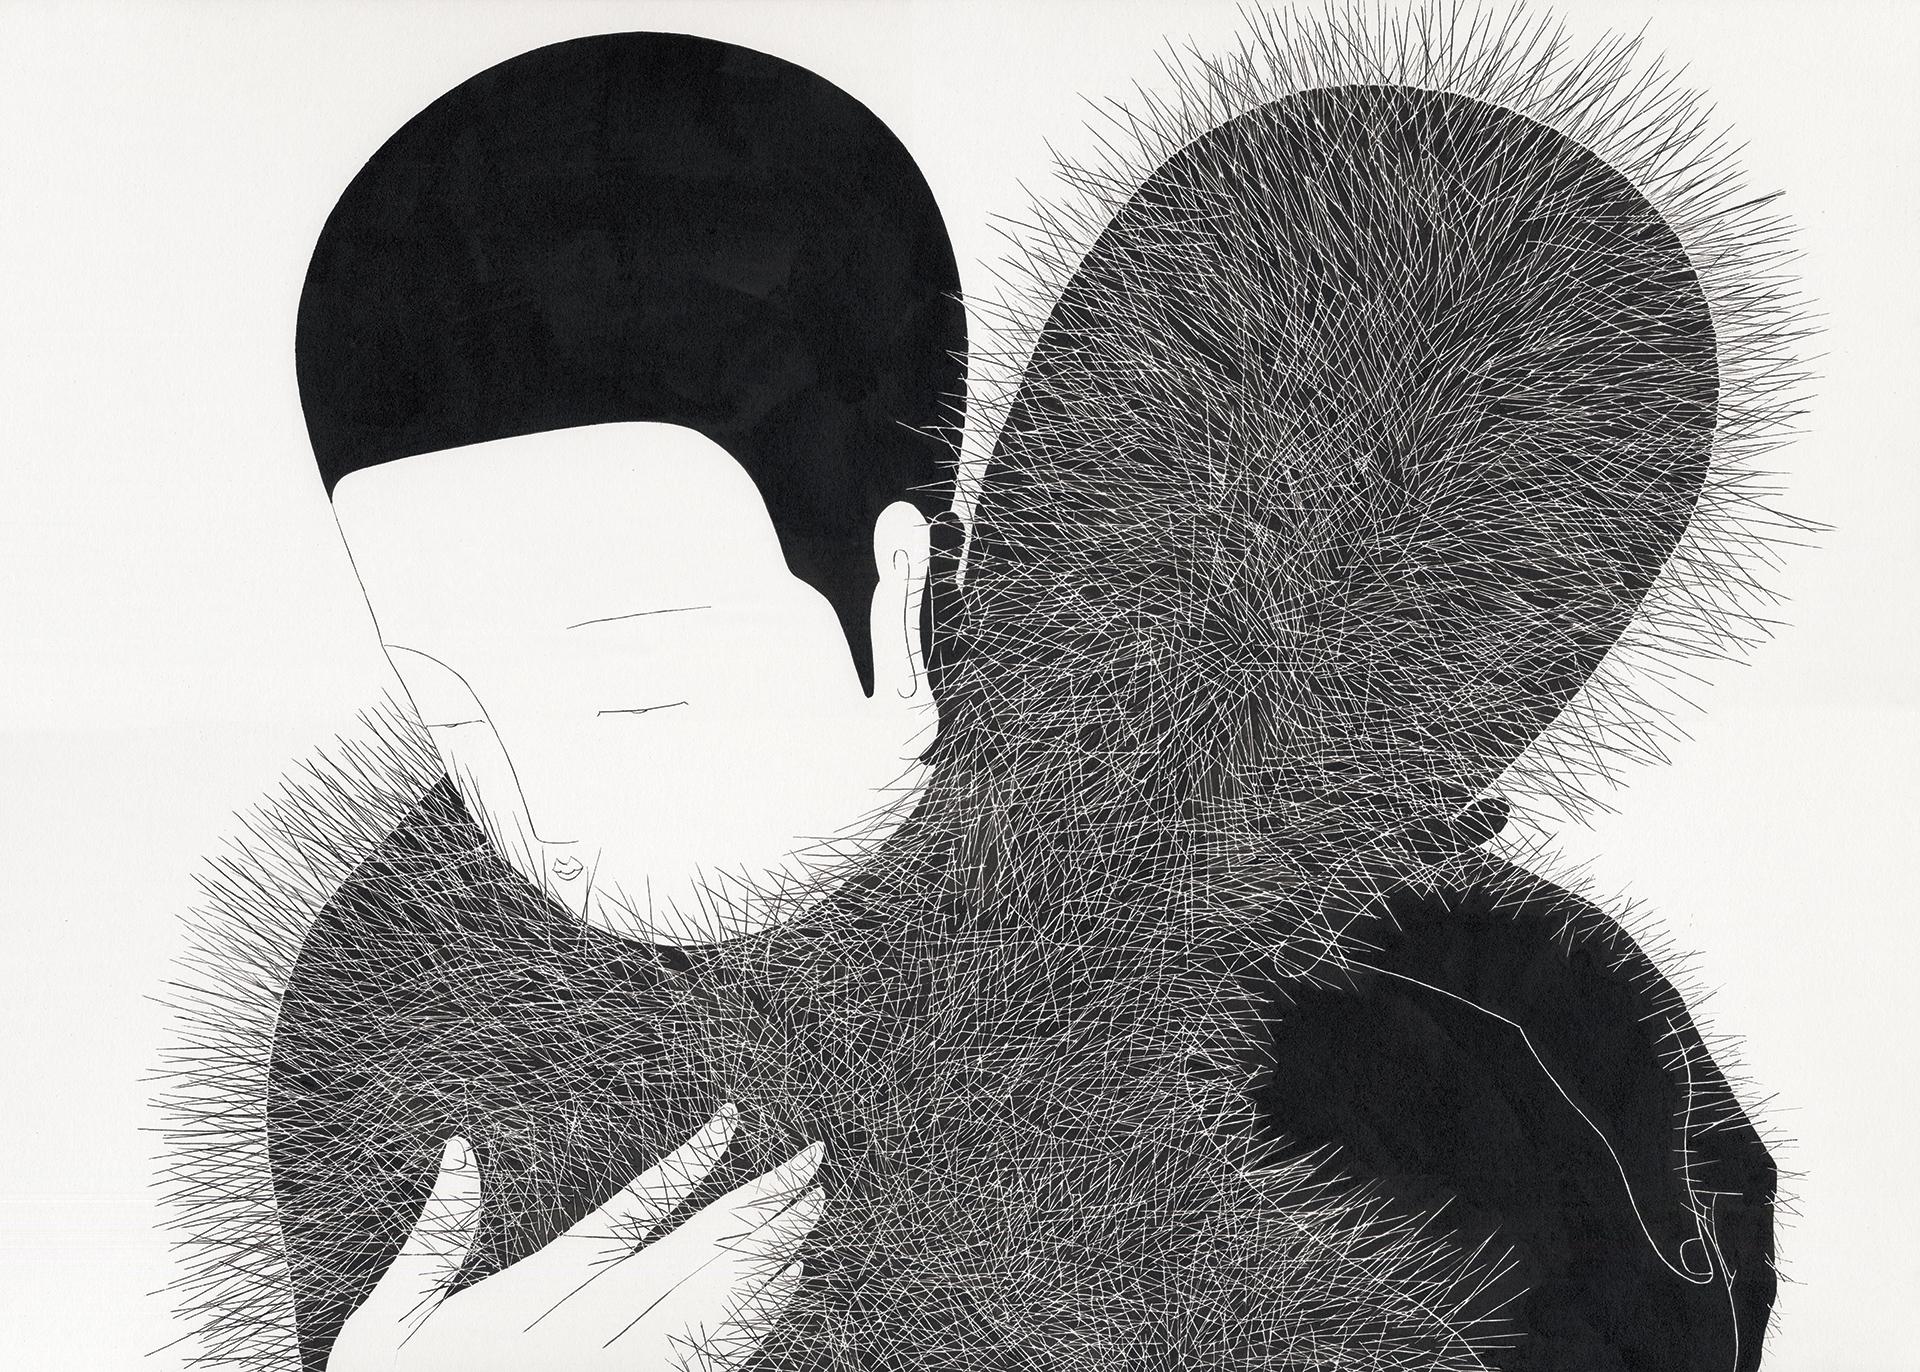 Embraceable-You-2016-Ink-on-paper-Laszka-gallery-Oslo-Norway.jpg